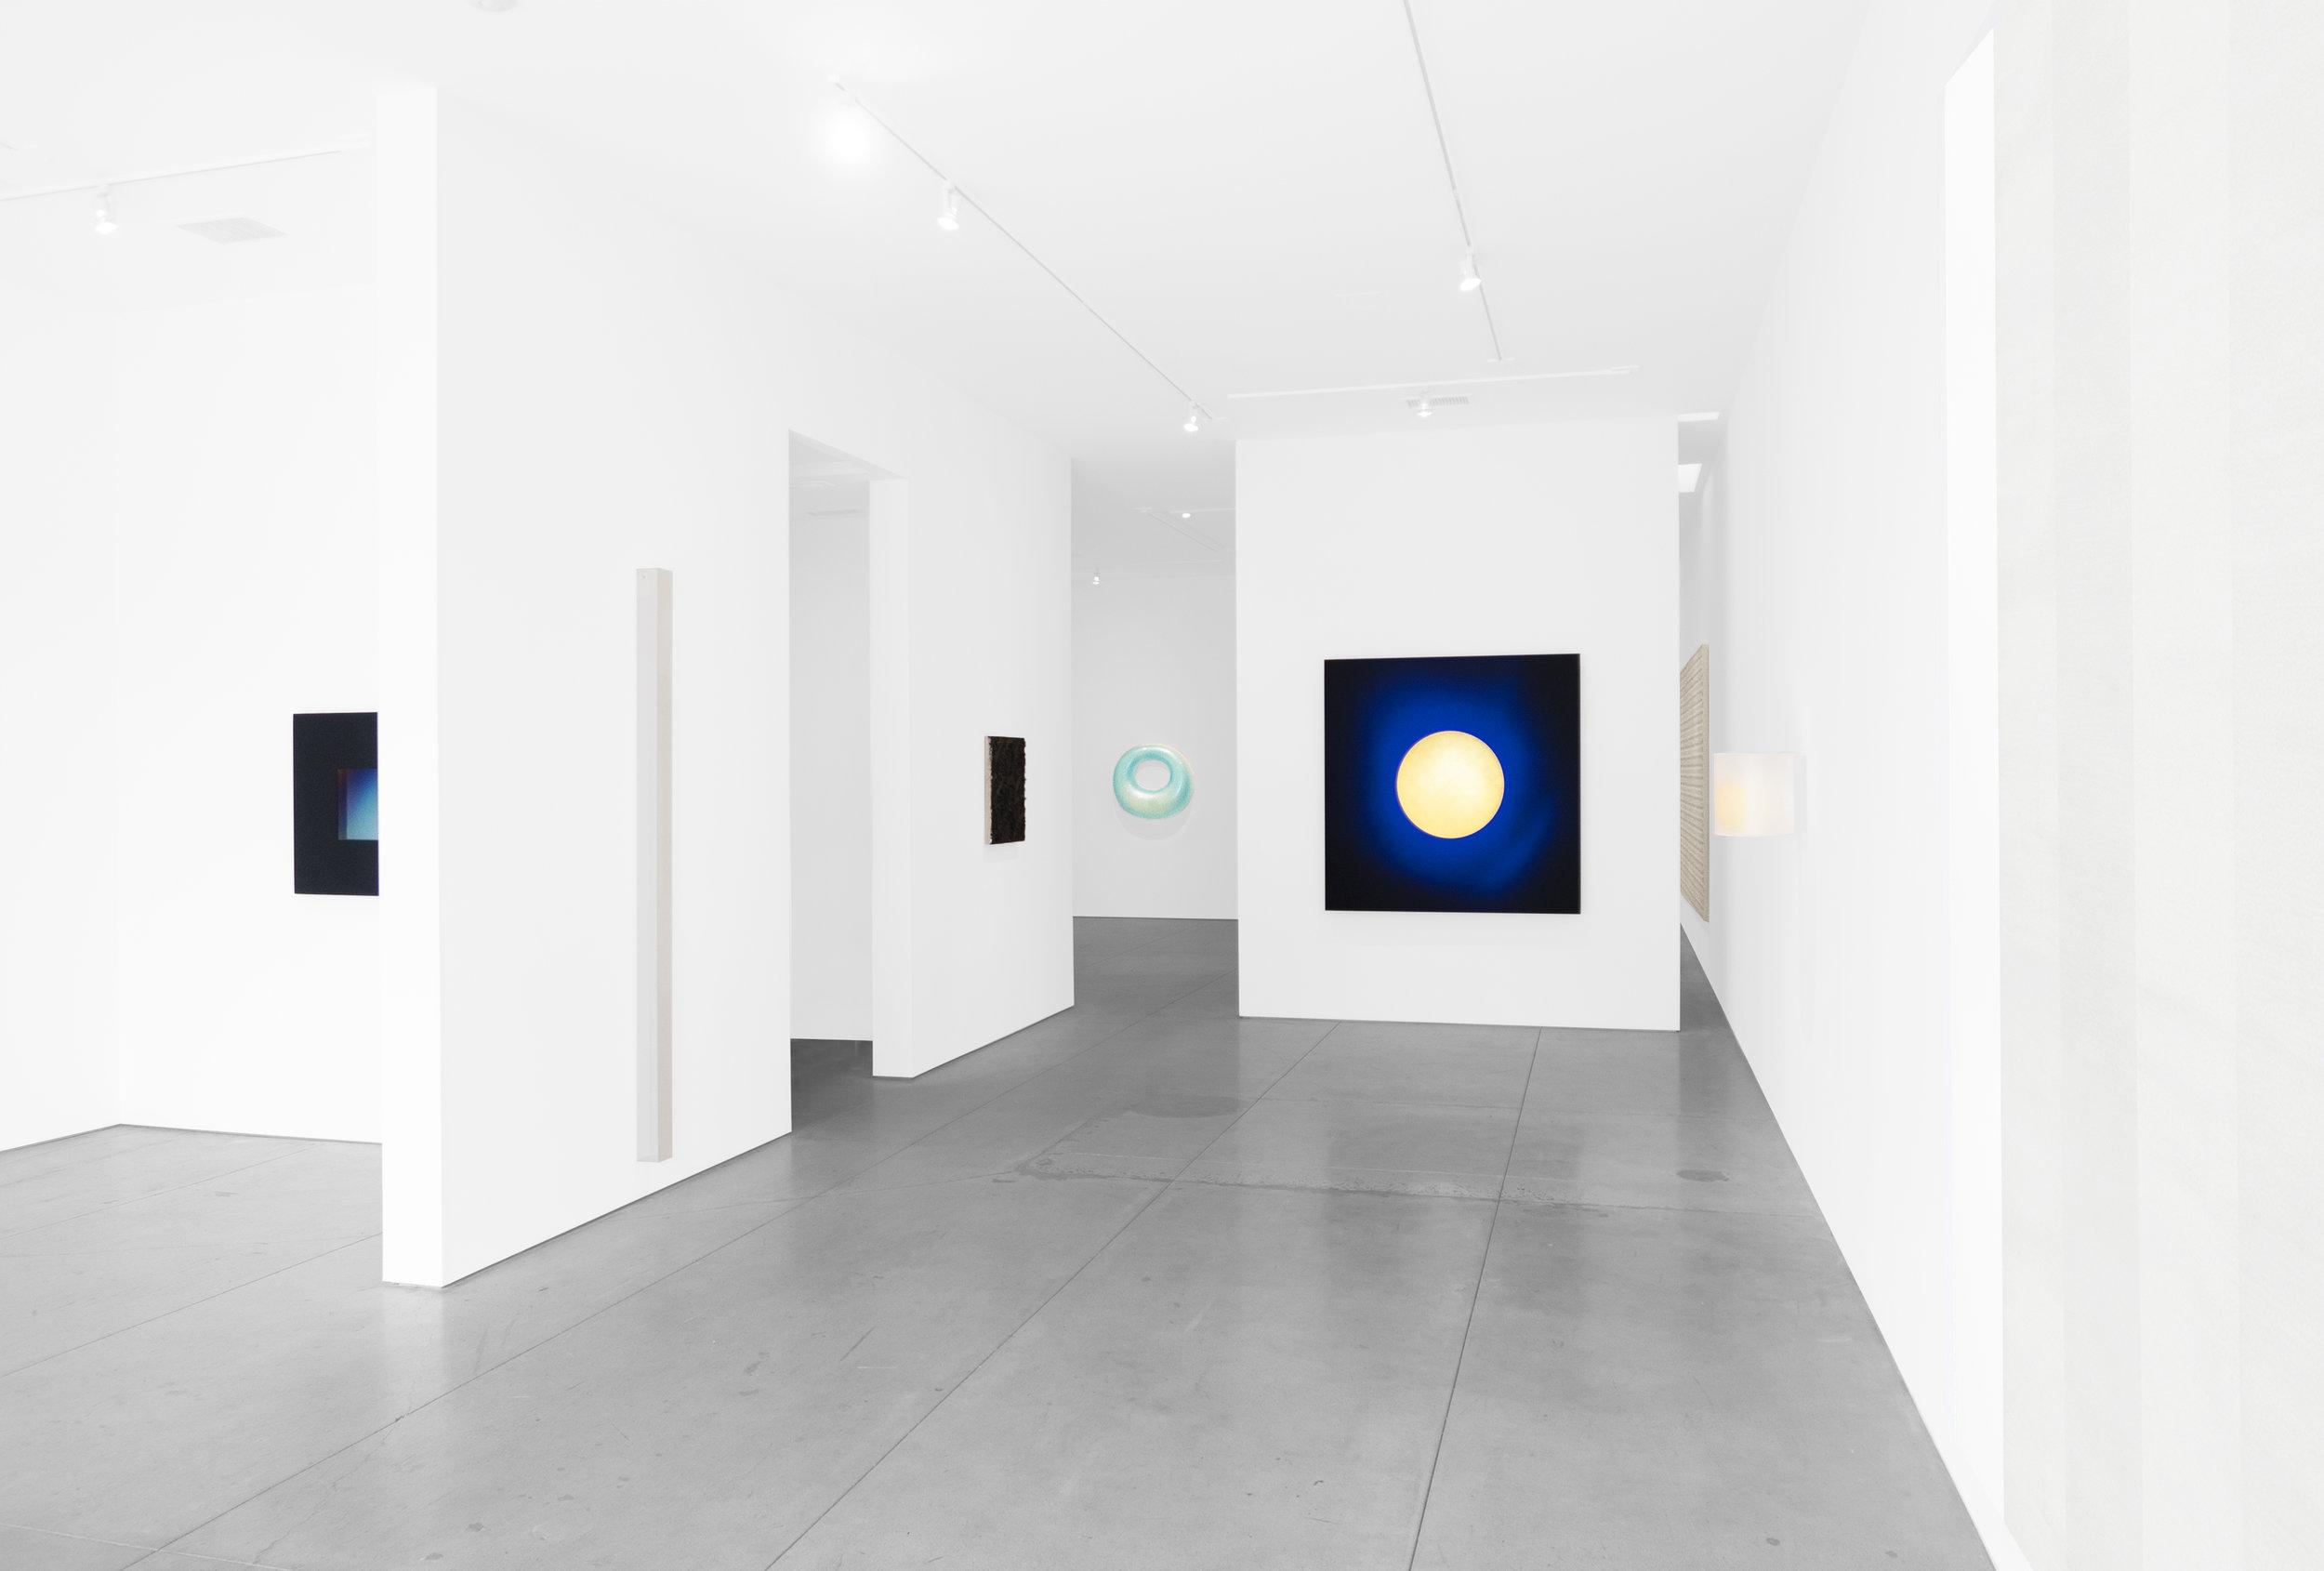 25 Years_Peter Blake Gallery_2019_Installation View_7.jpg